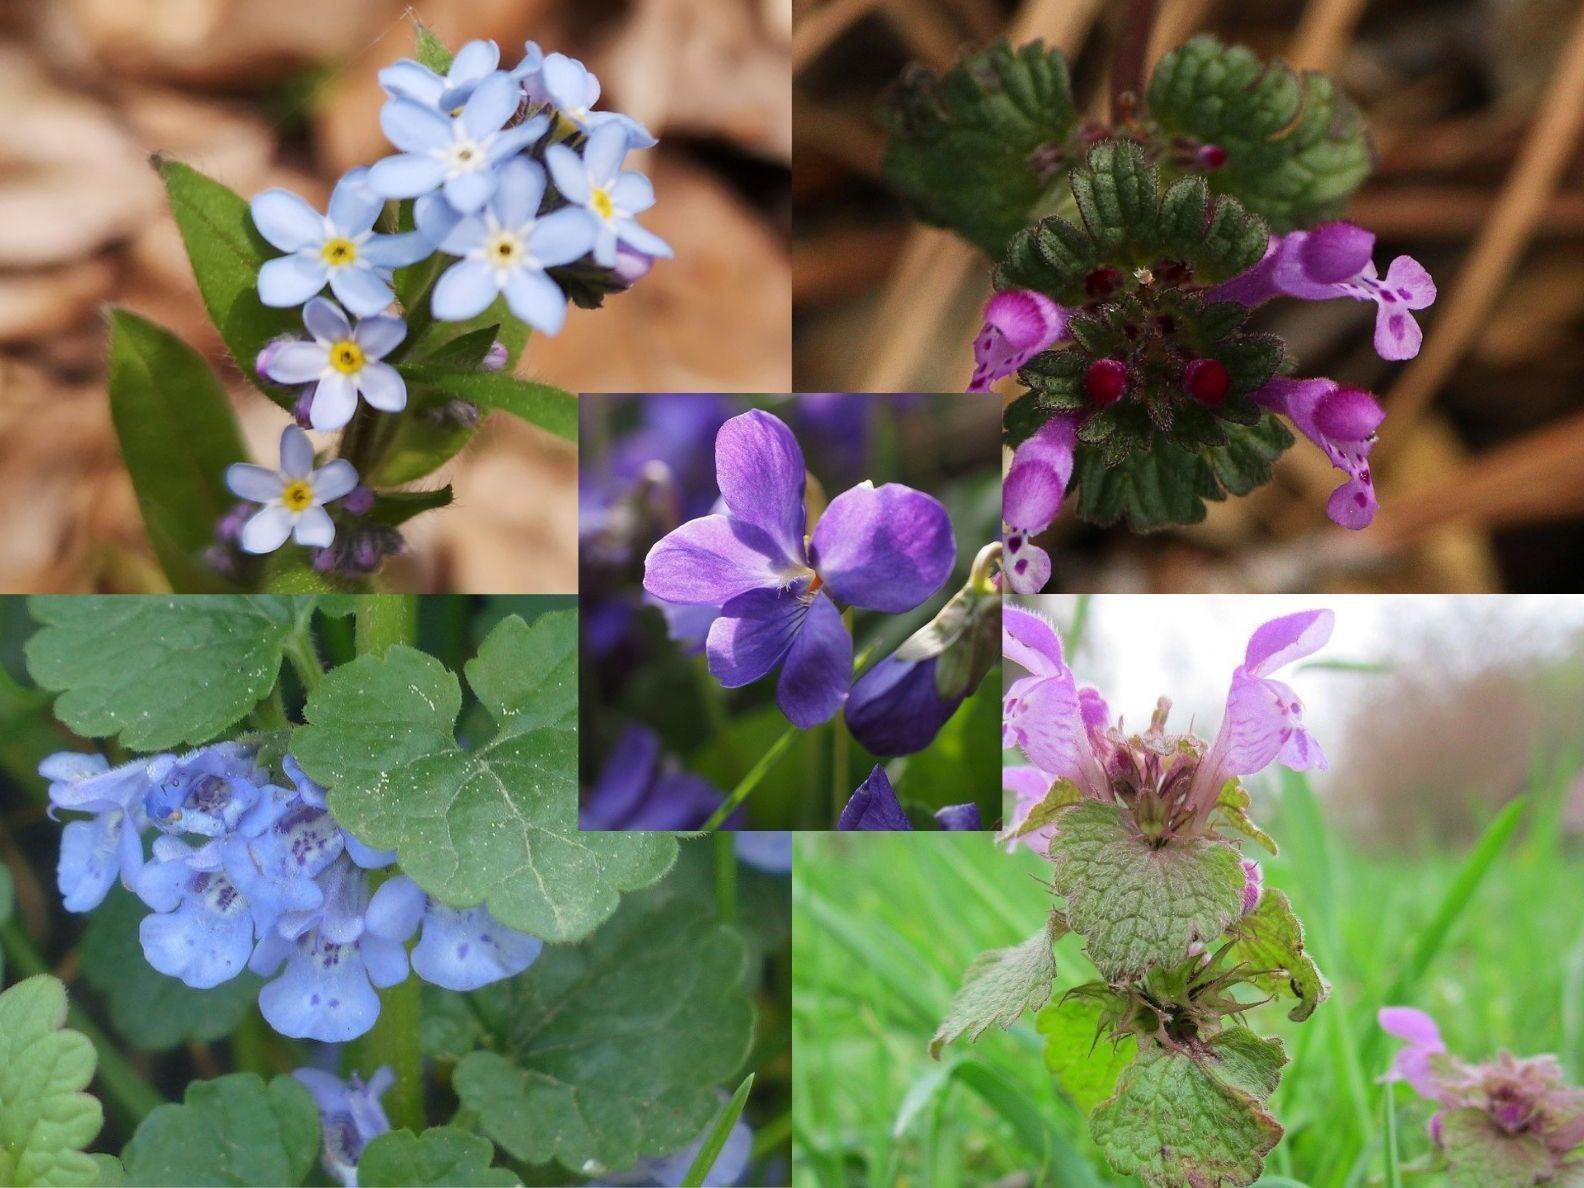 Weeds With Purple Flowers-GardensAll.com